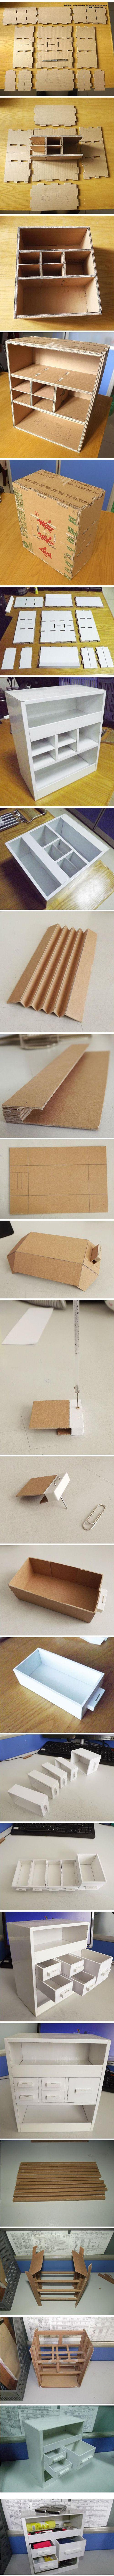 Storage Box with Drawer | Materials: Corrugated Cardboard | Instructions: http://tieba.baidu.com/p/1537506603